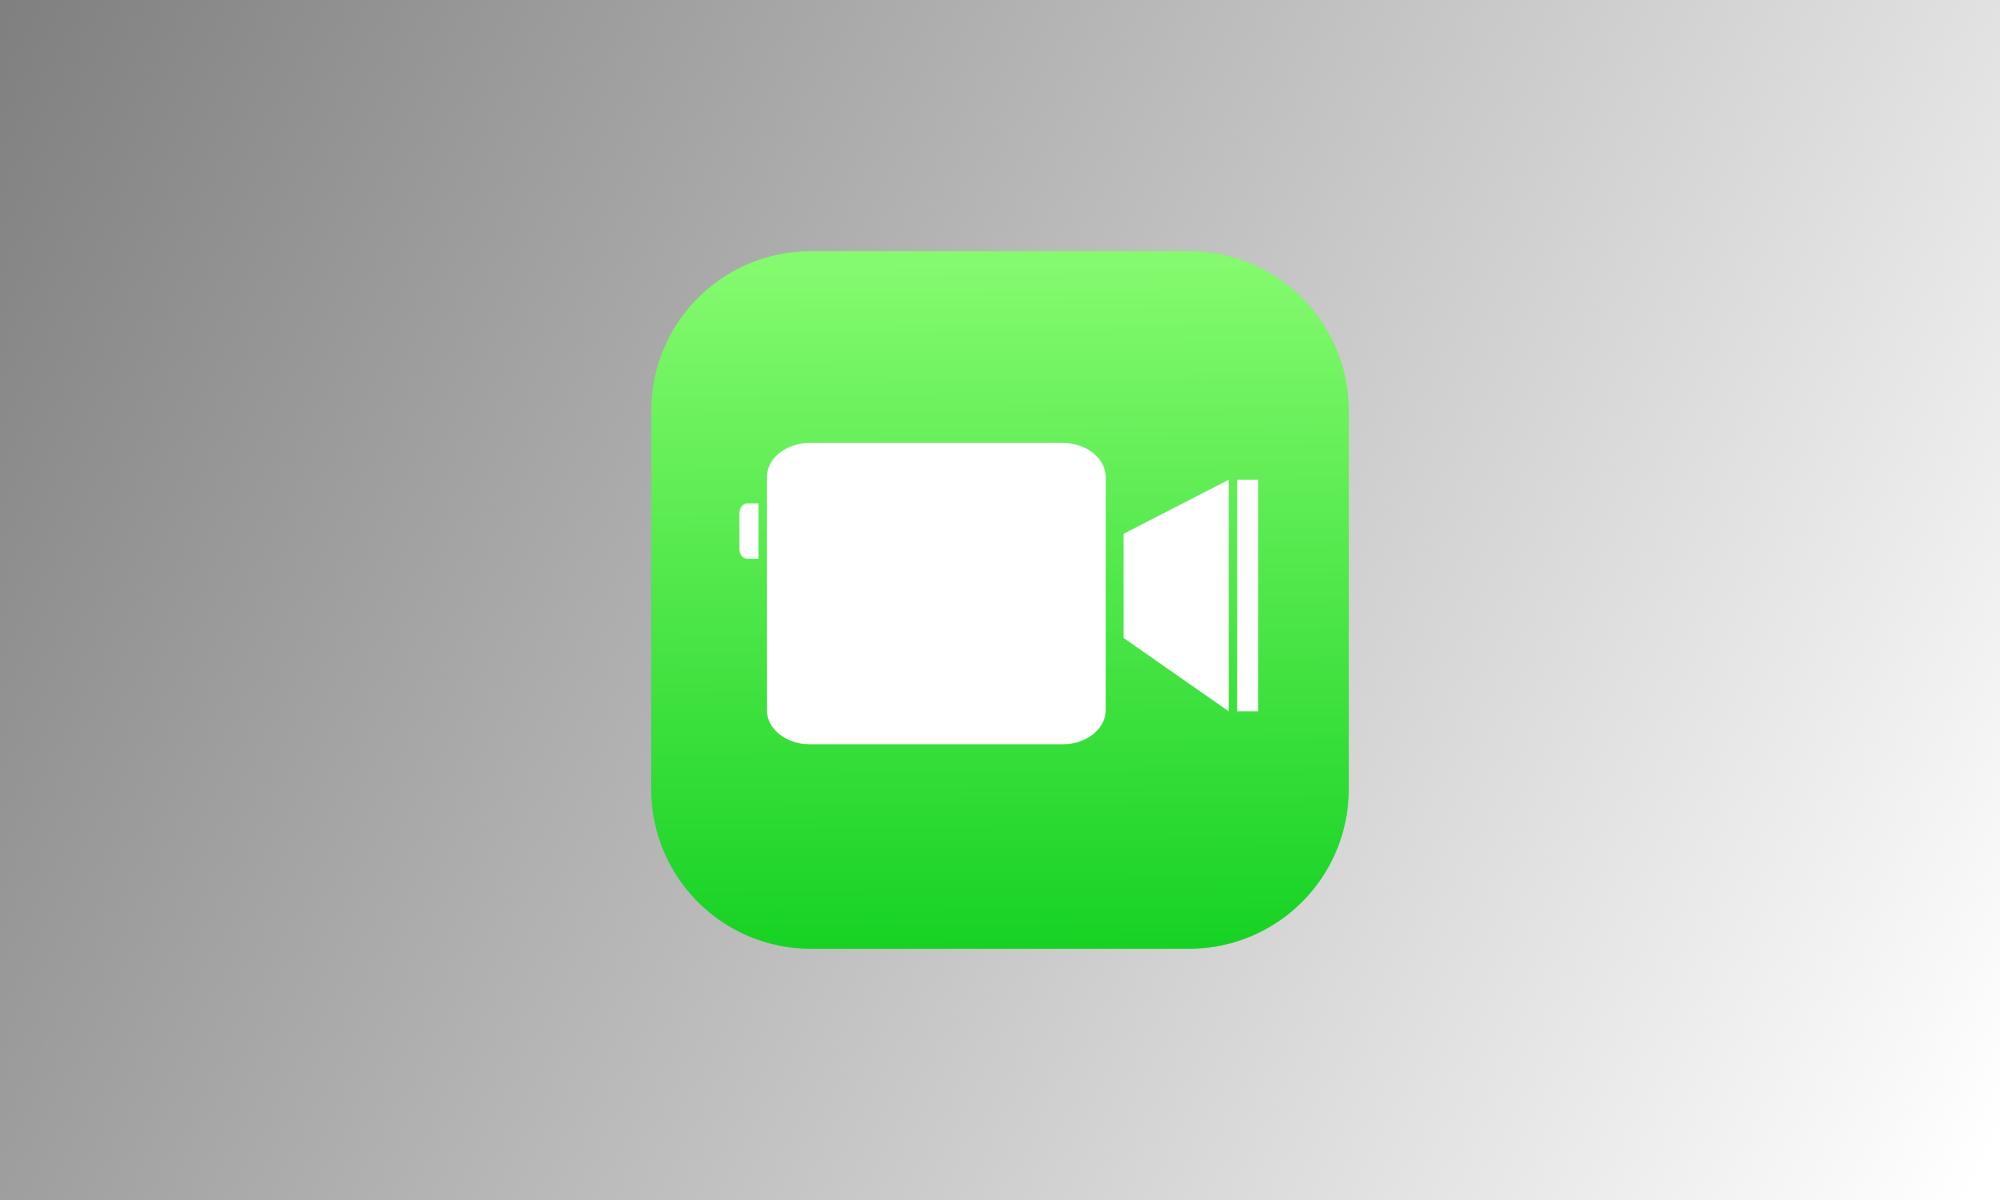 Facetime funktioniert nicht: iOS 10/10.3.1 Probleme